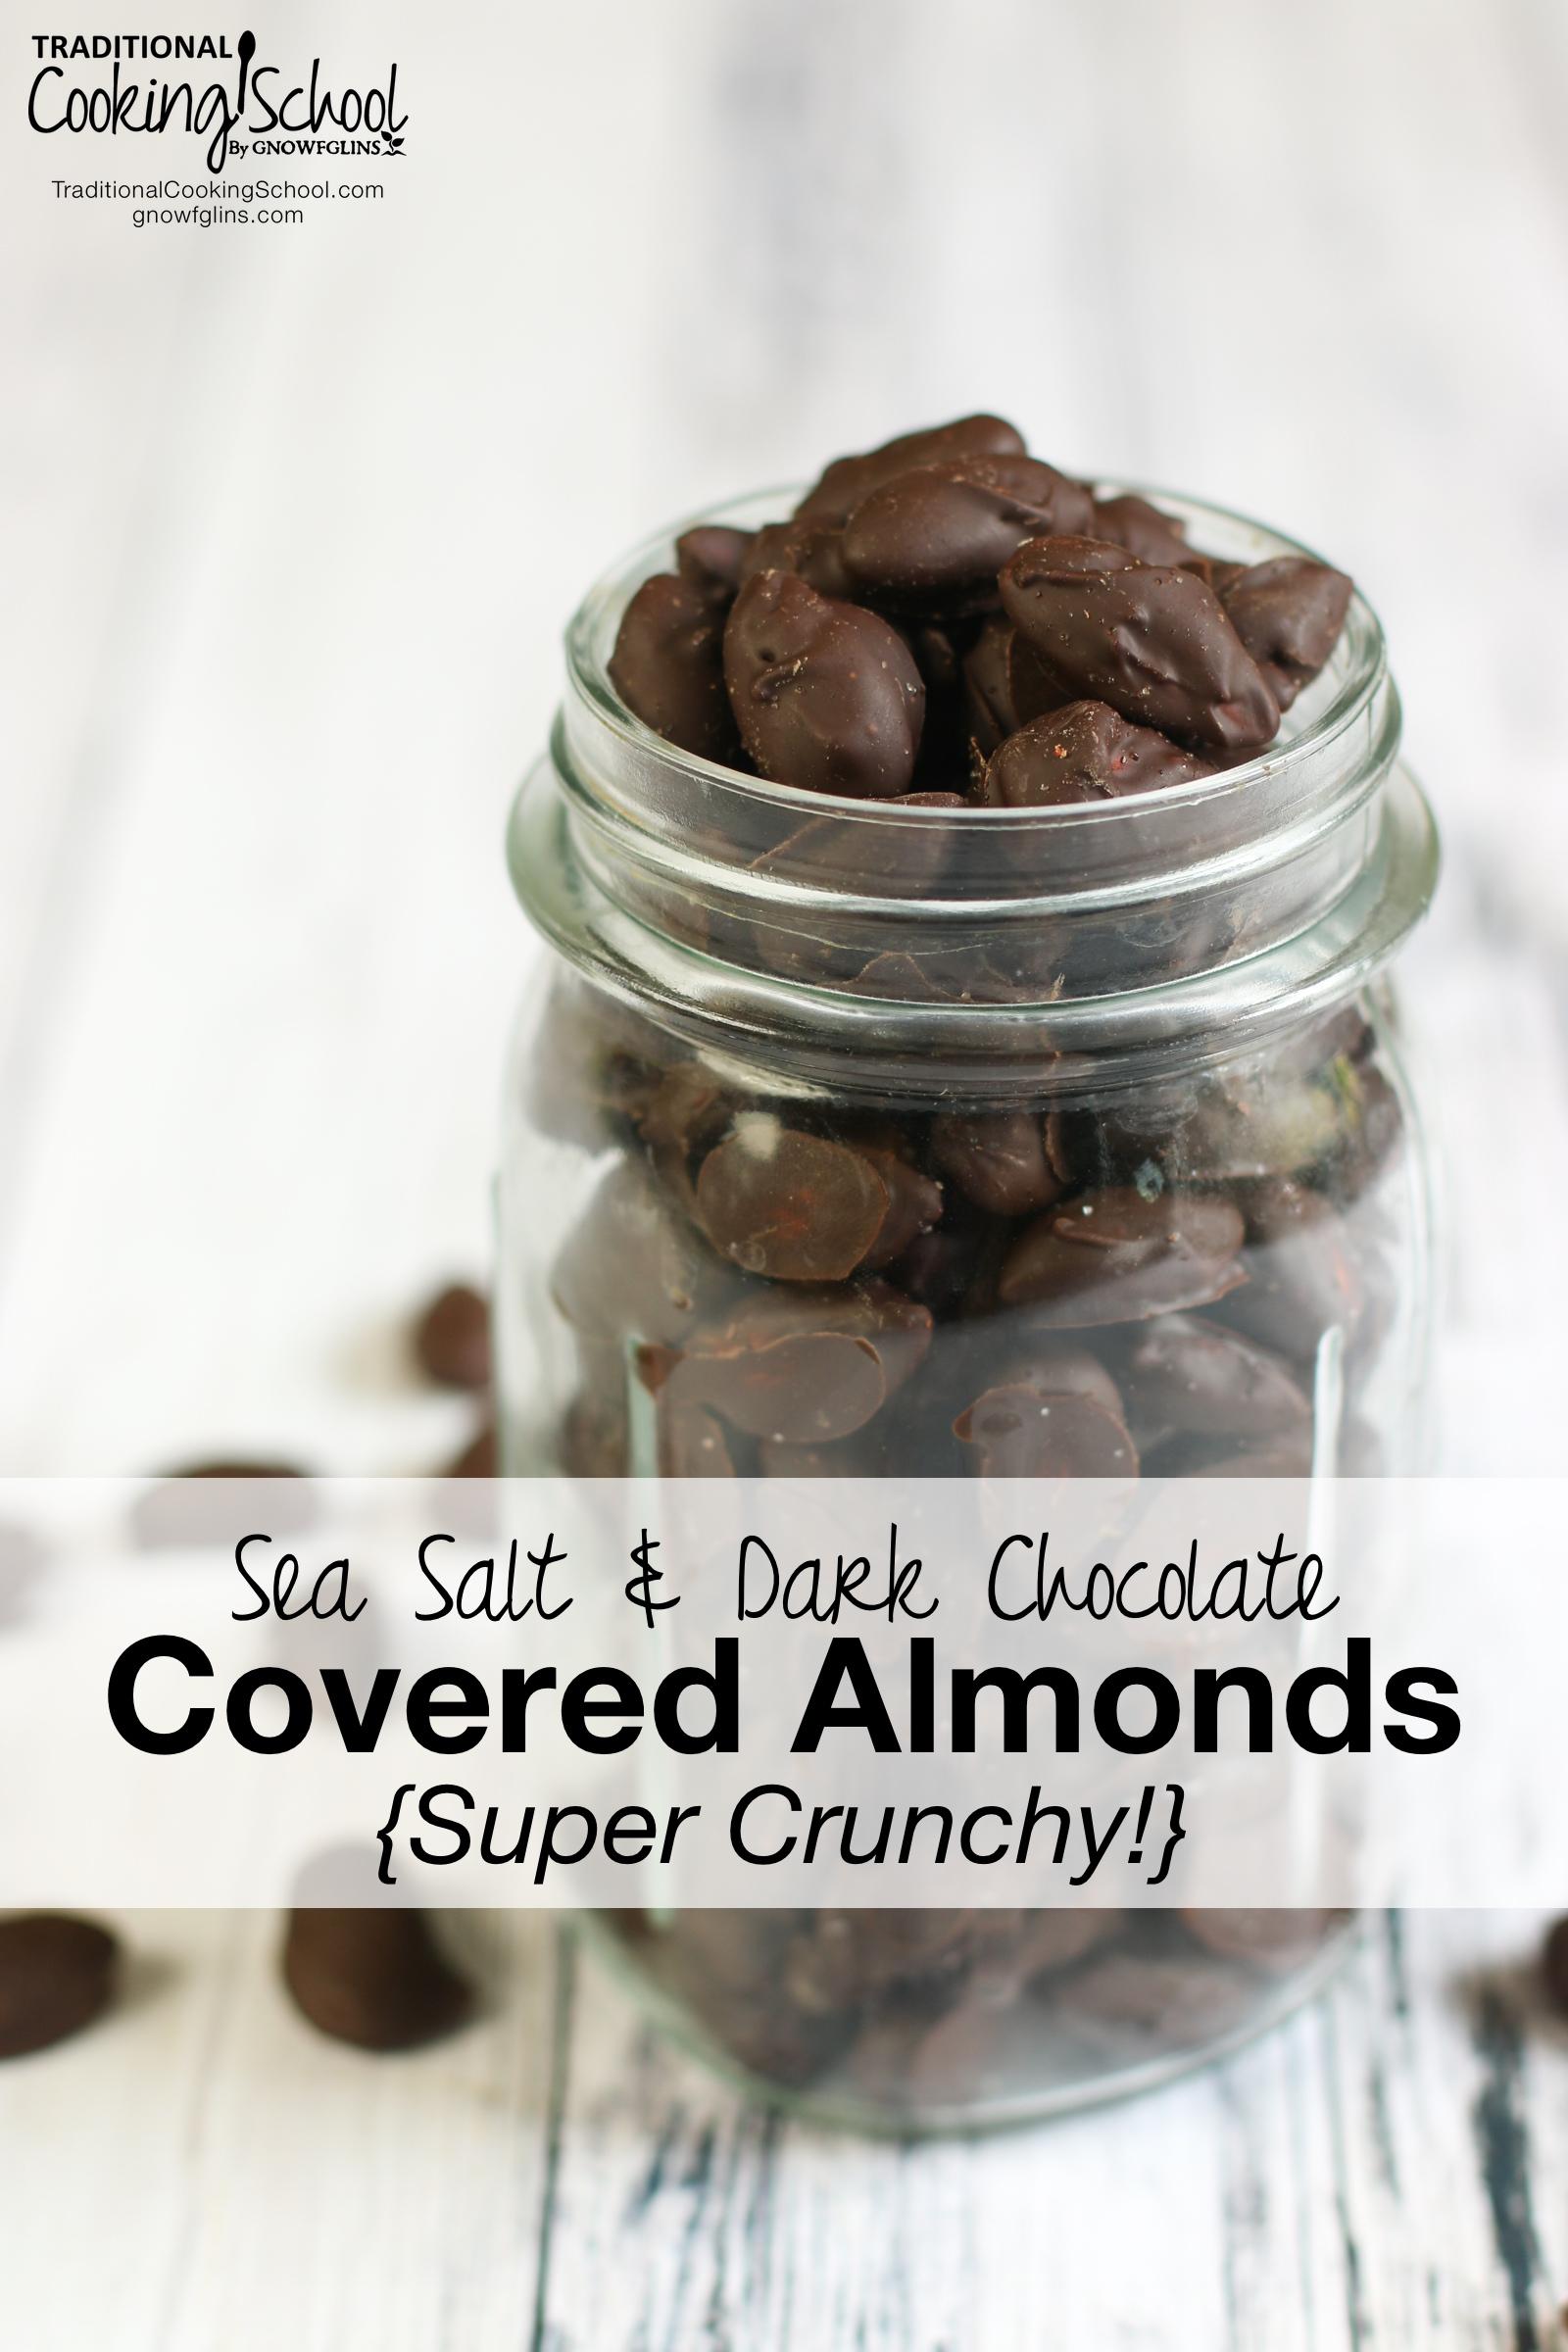 Sea Salt & Dark Chocolate Covered Almonds {Super Crunchy!} |